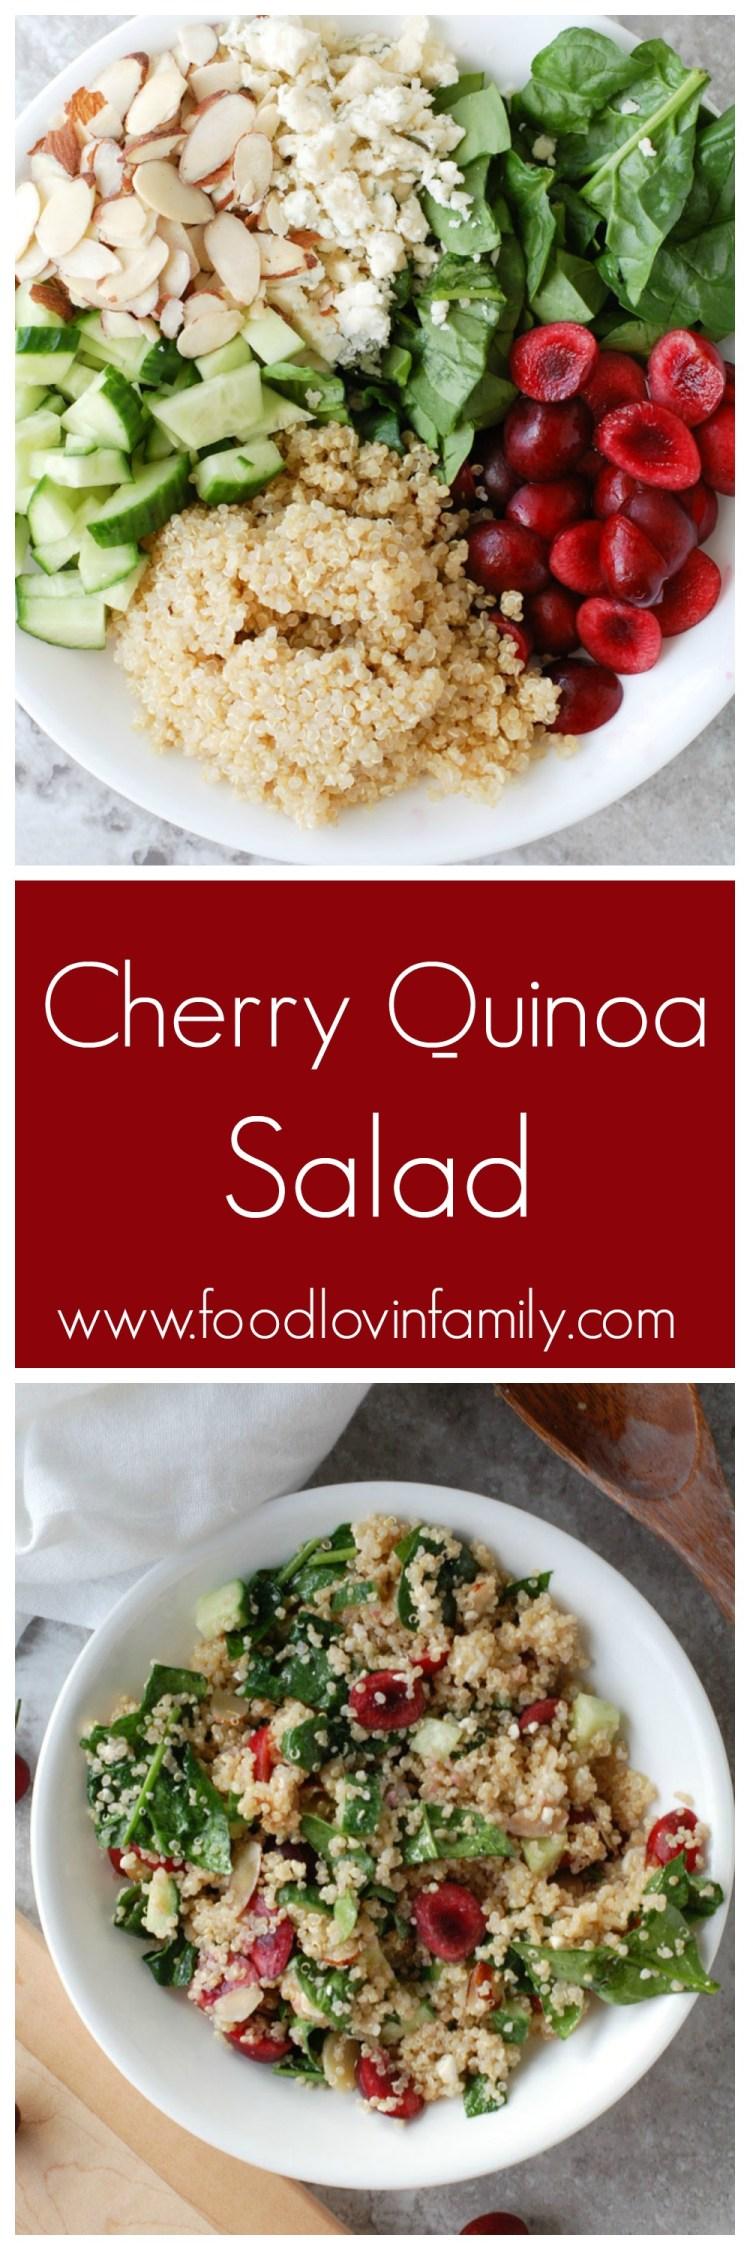 Cherry quinoa salad combines fresh sweet cherries, quinoa, spinach, almonds and blue cheese.